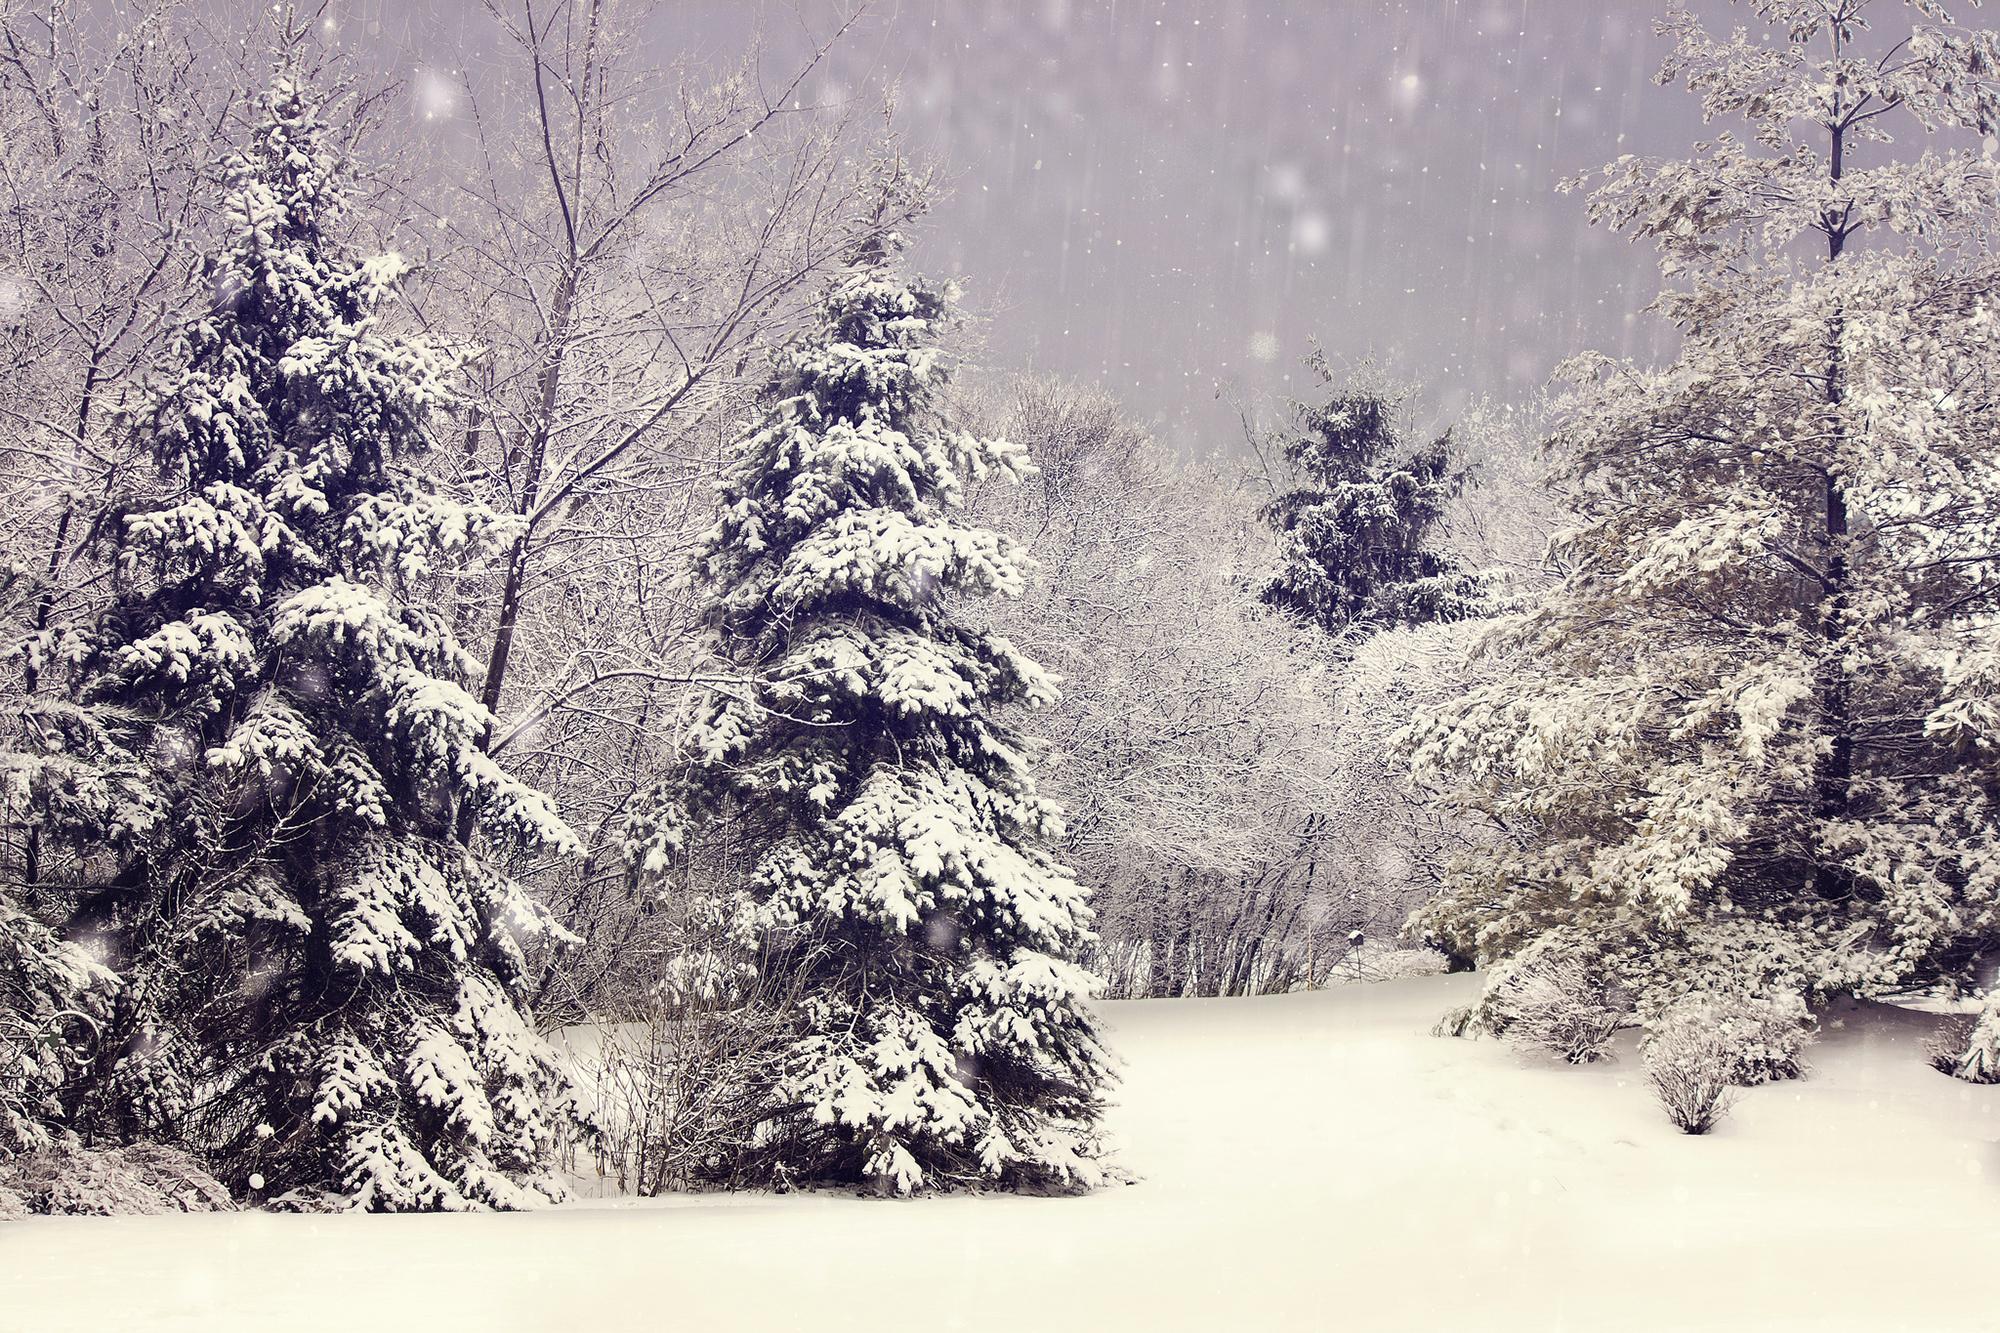 снег ветви лес snow branches forest  № 442857 бесплатно